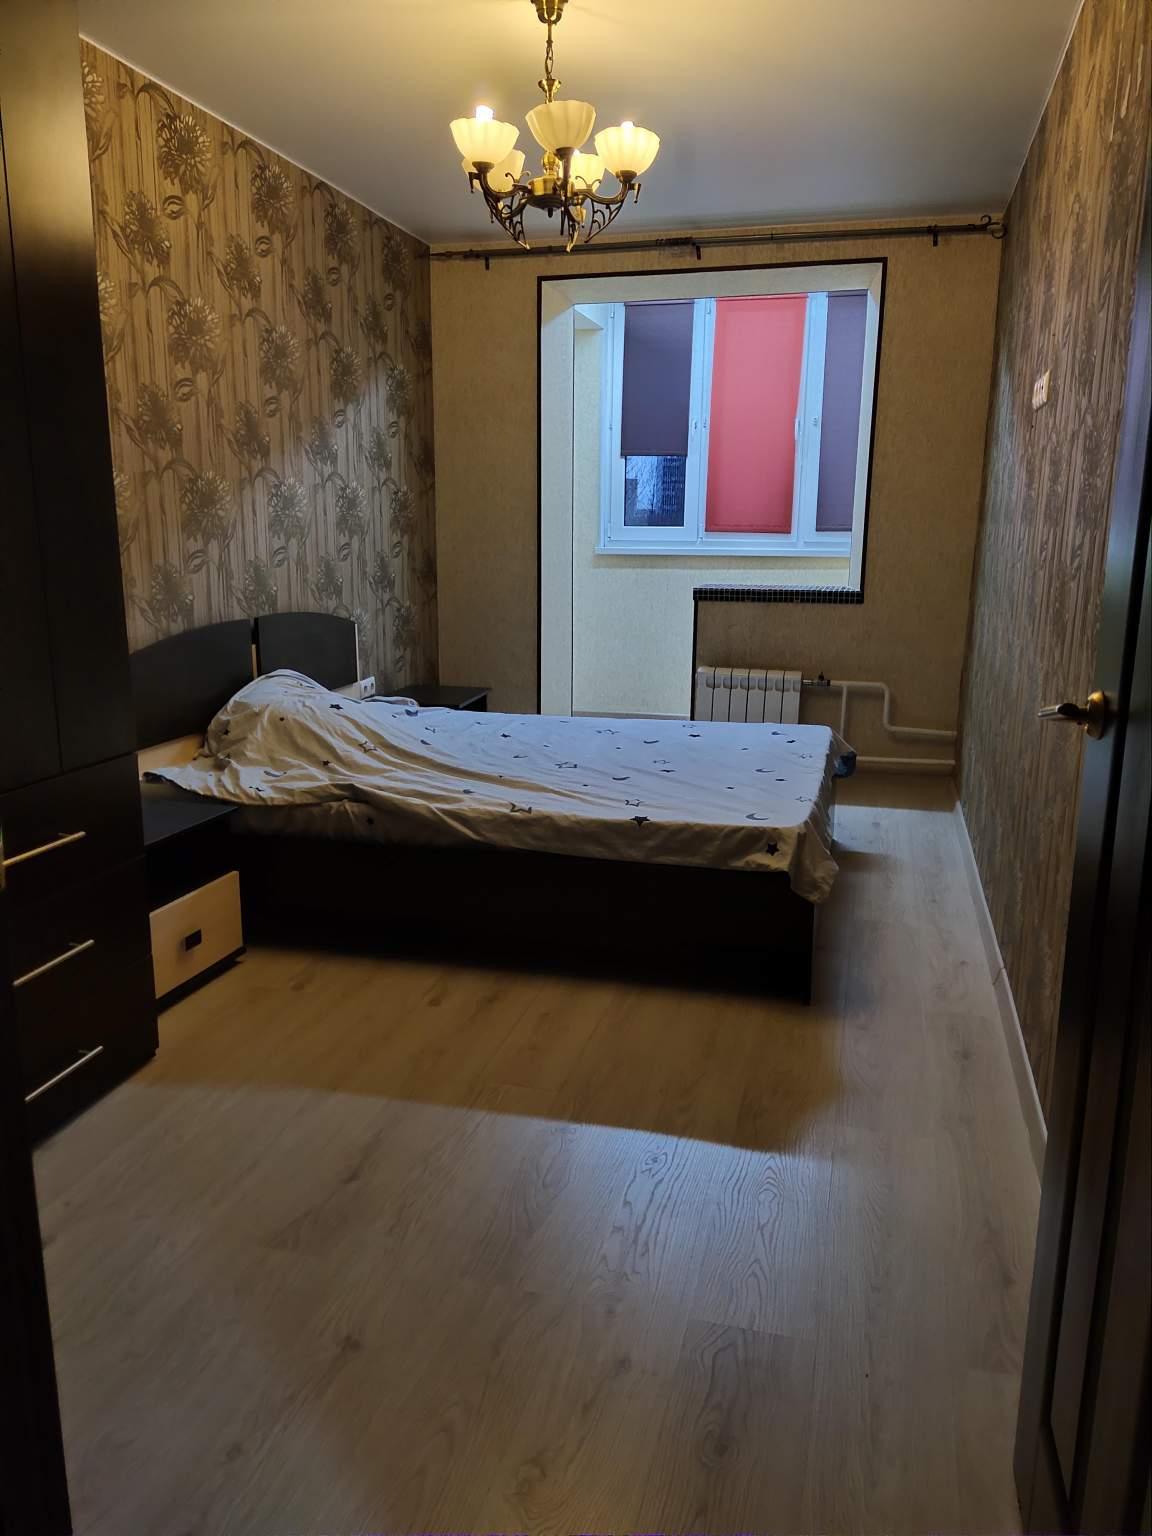 Аренда 3-комнатной квартиры, Москва, Щёлковское шоссе,  д.12 к1